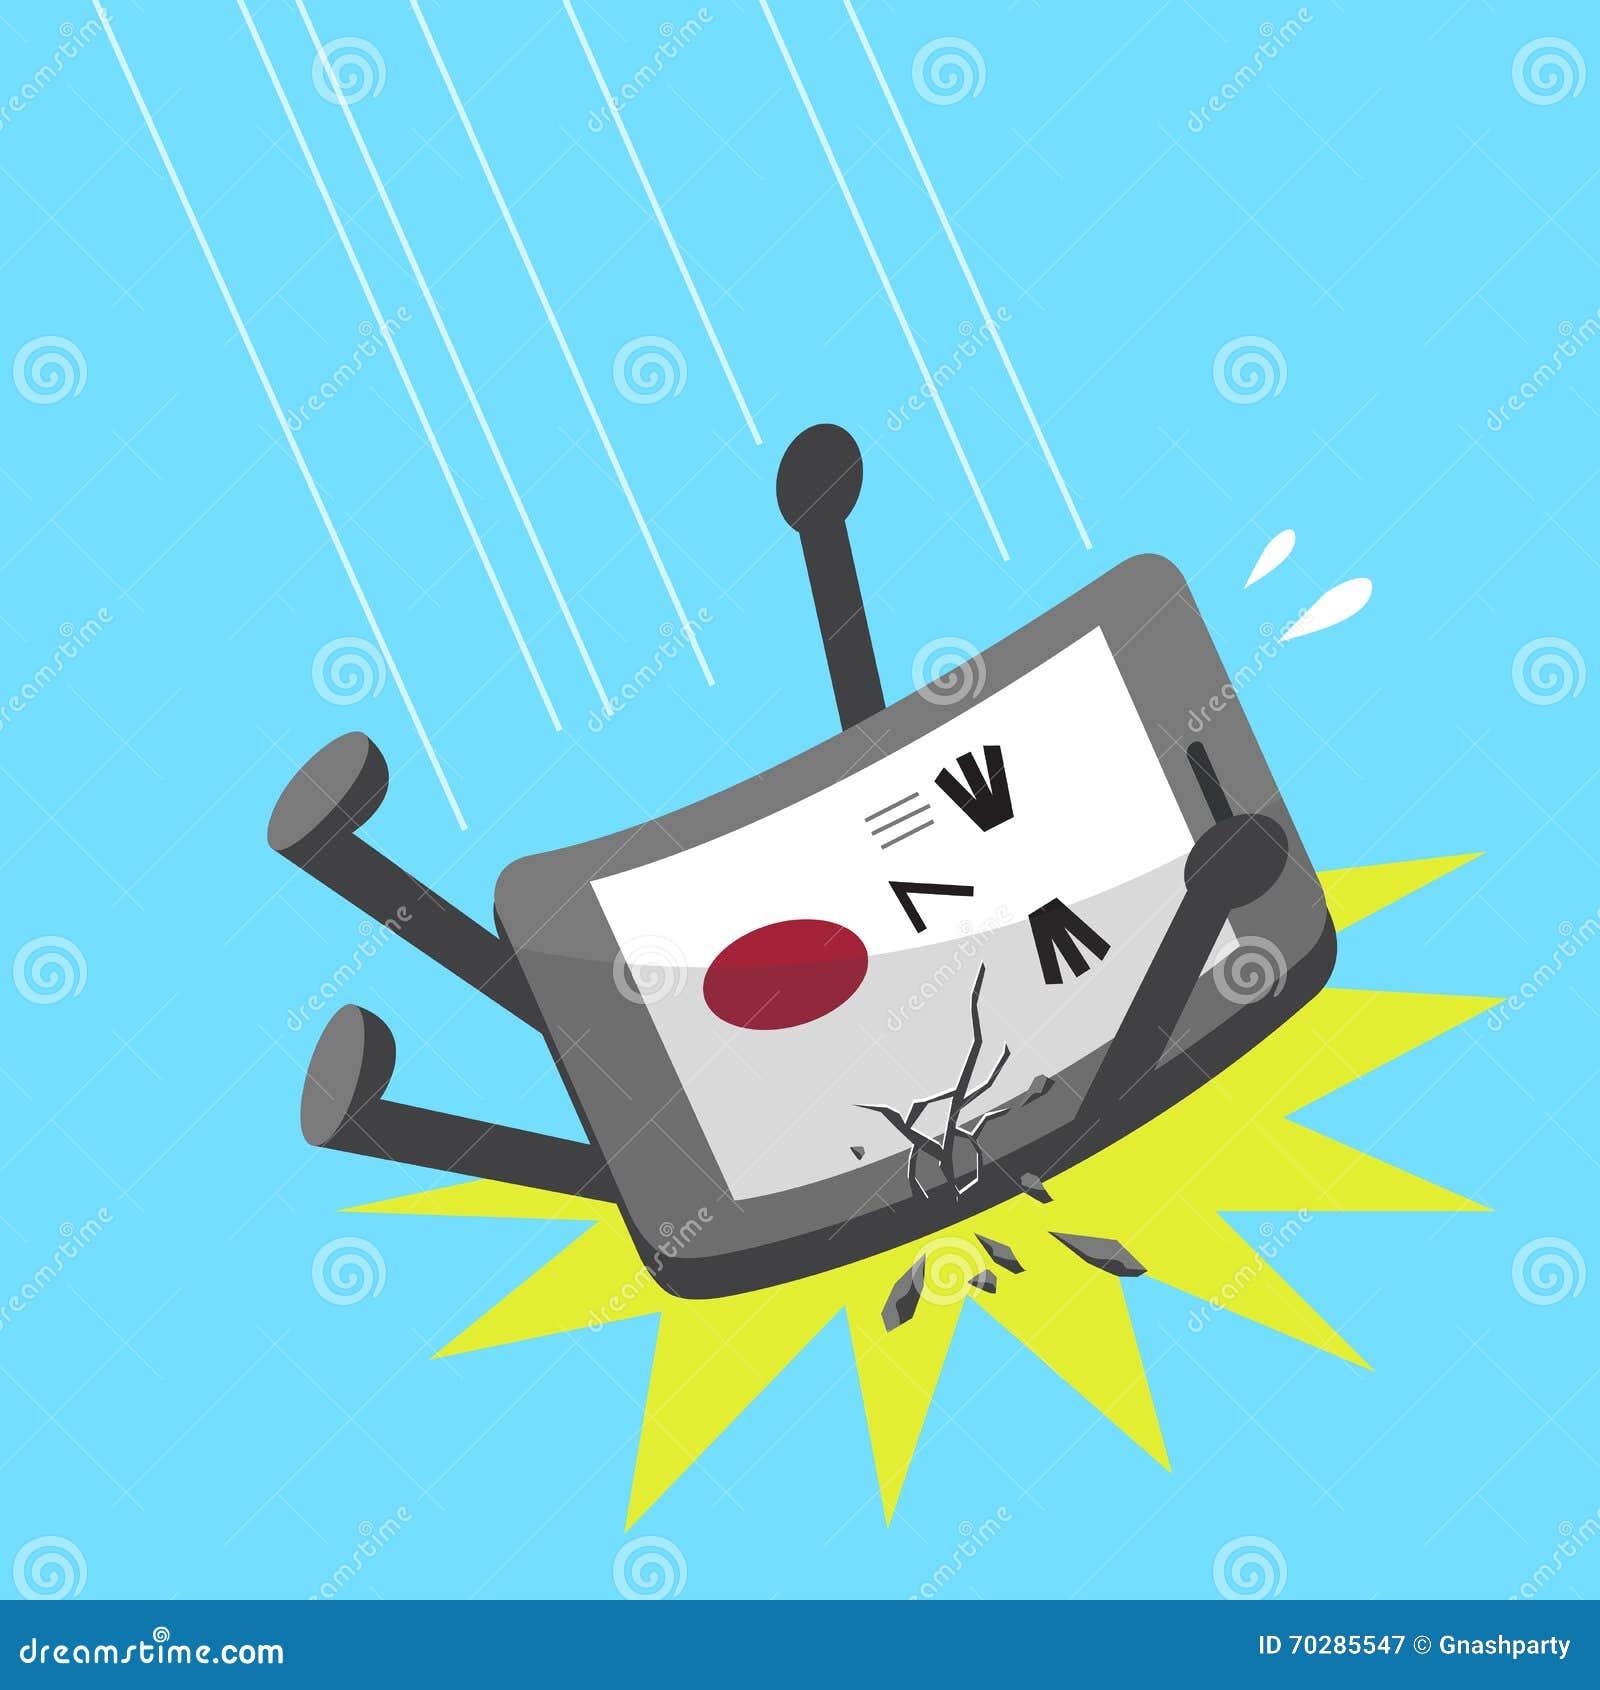 Cartoonsmart Character Design : Cartoon falling smartphone character stock vector image